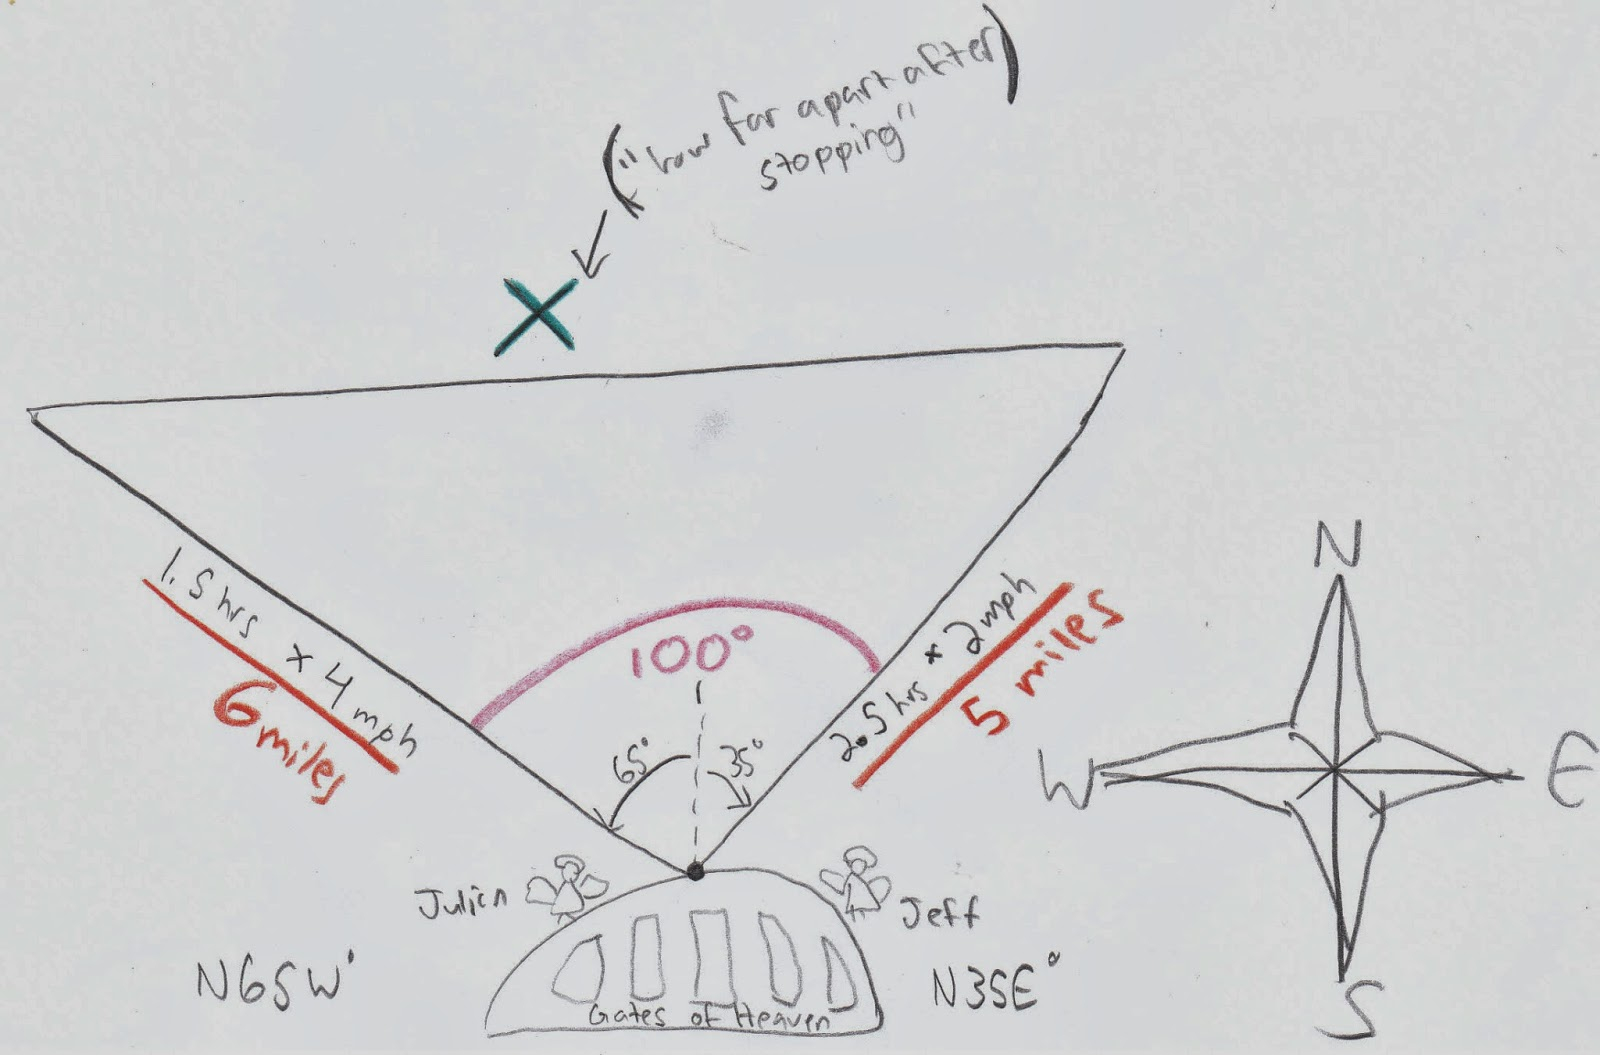 Demosthenes Wpp 13 Amp 14 Unit P Concept 6 Amp 7